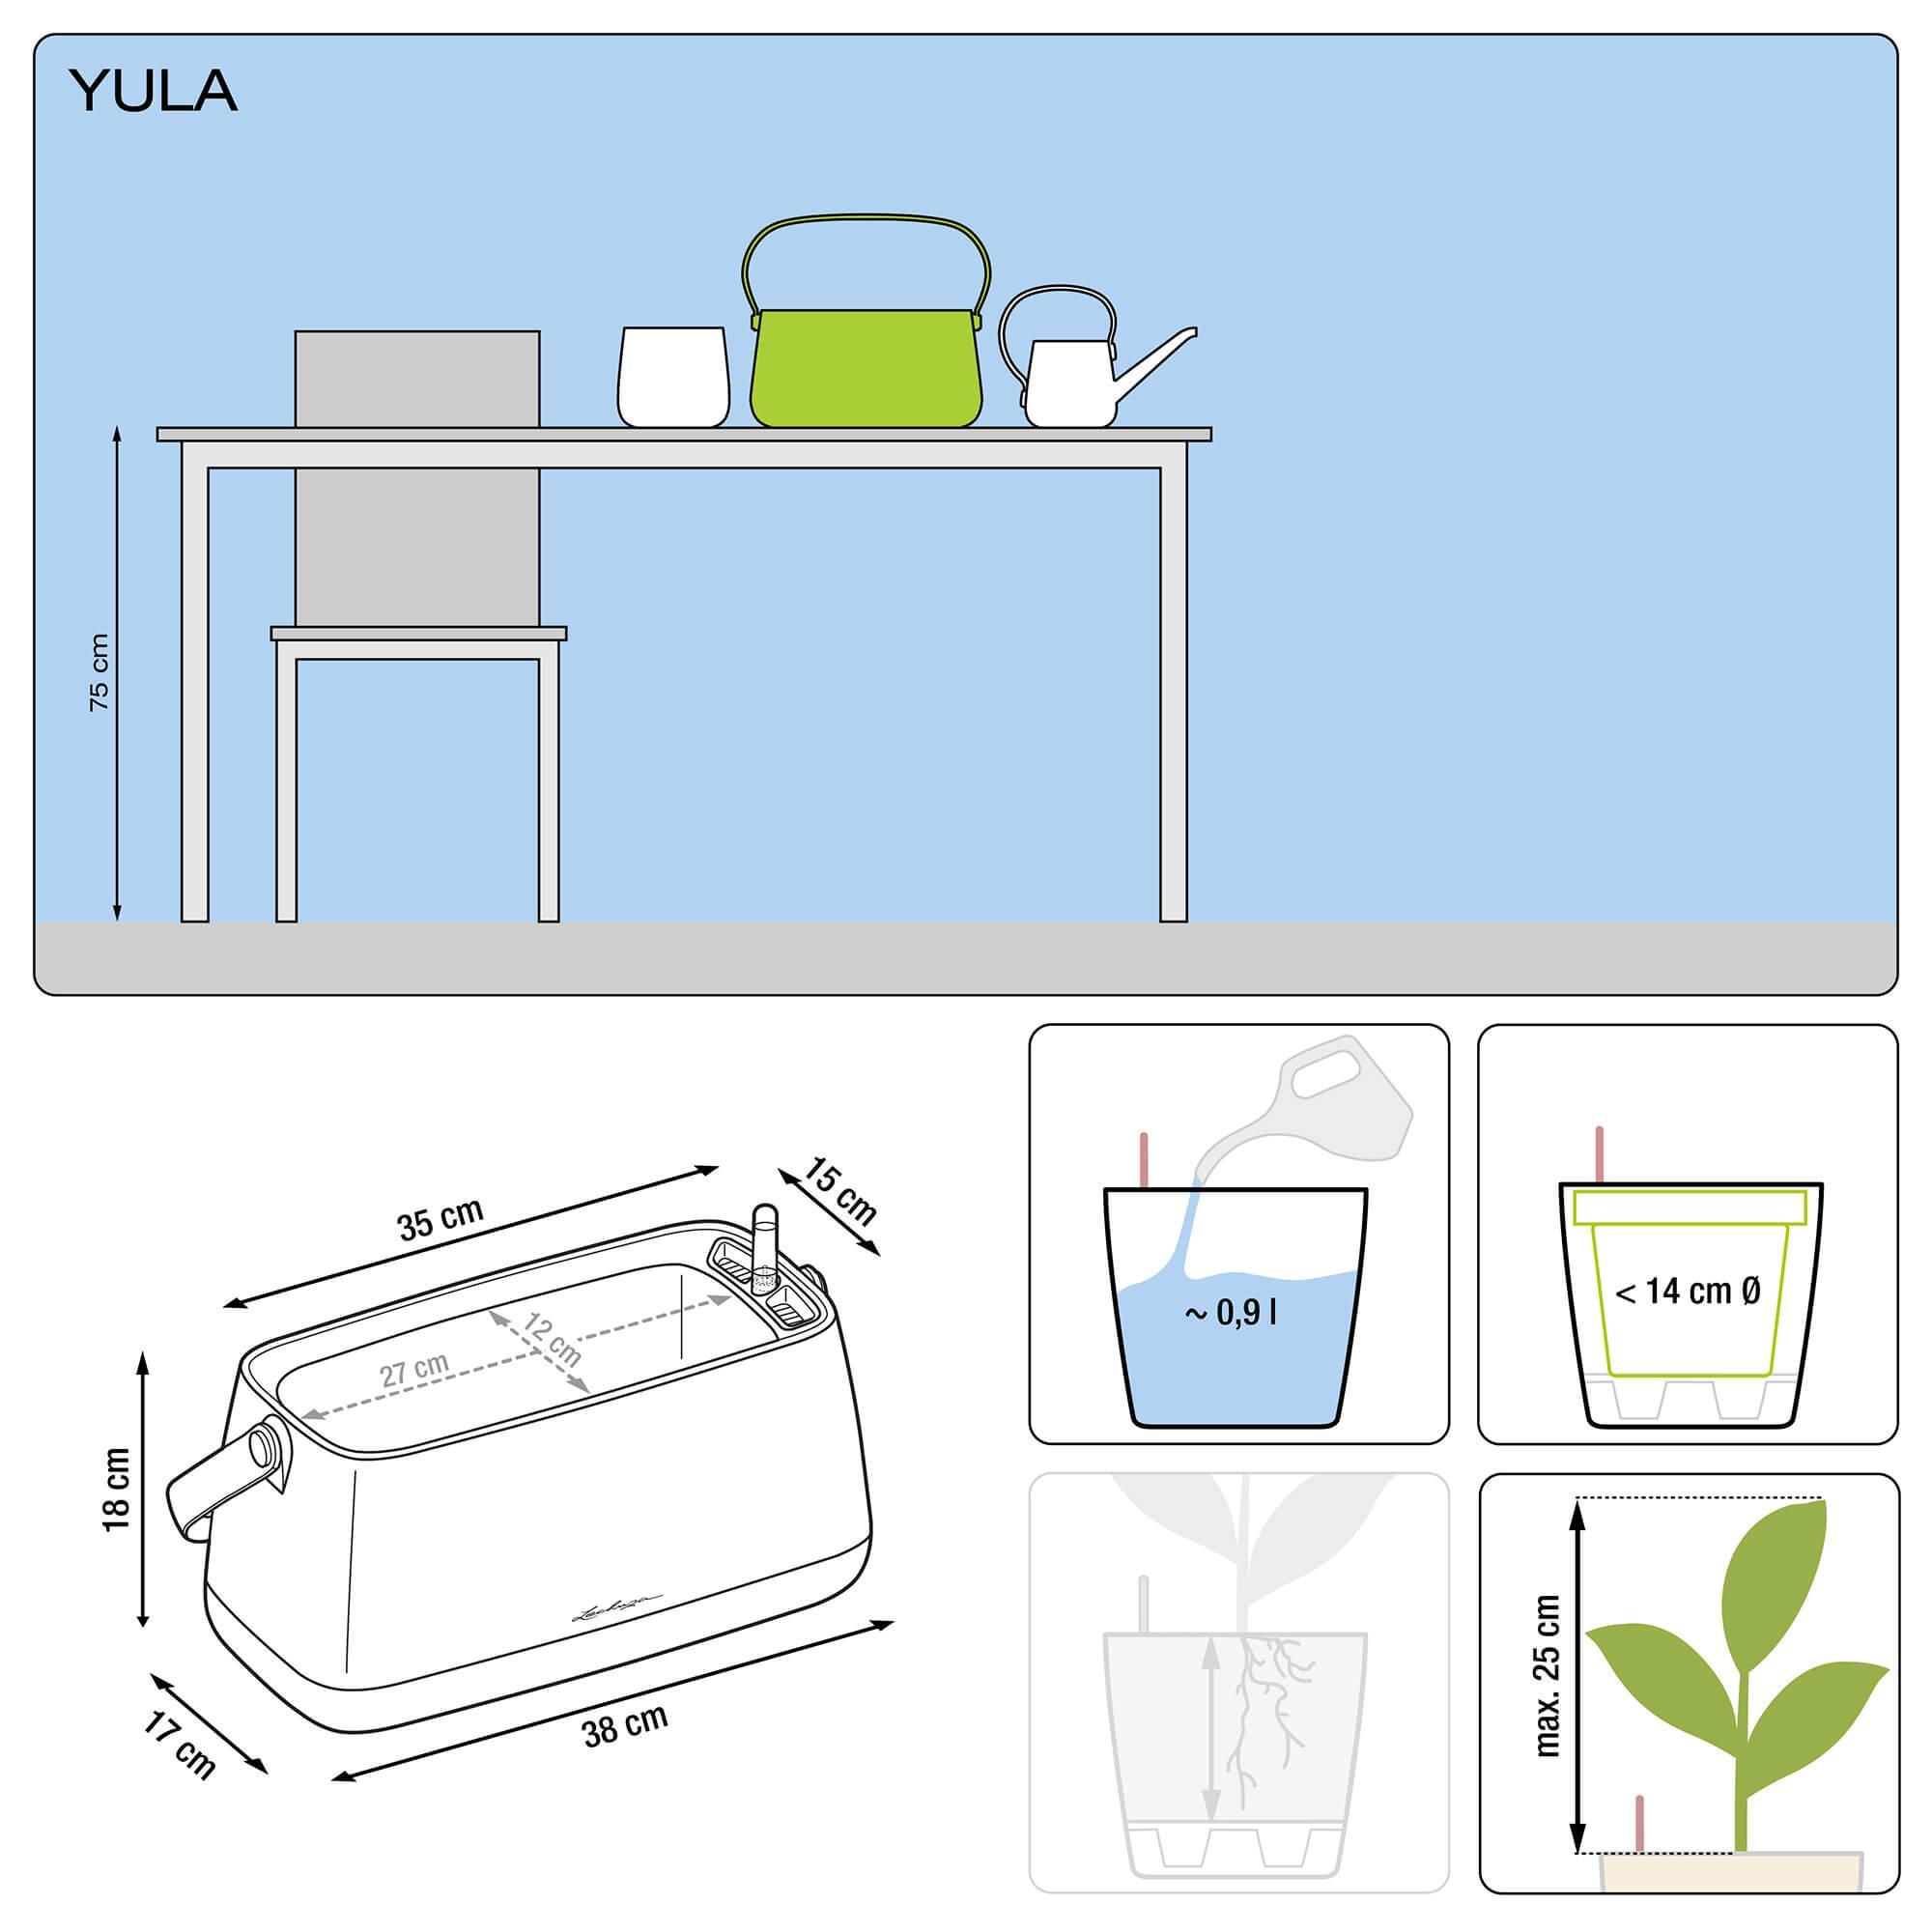 Jardinière YULA blanc/gris satiné - Image 2